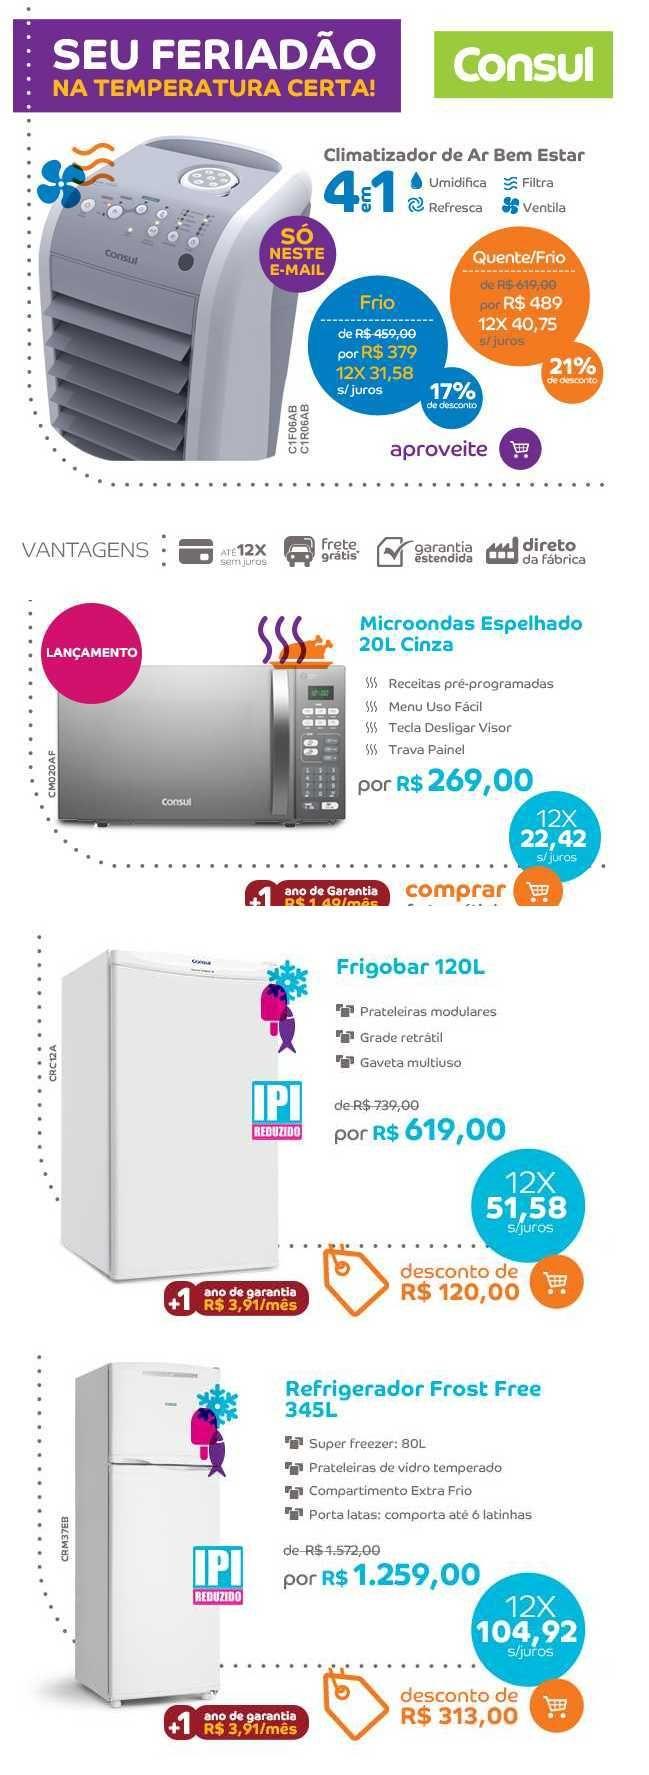 E-mail Marketing: Elementos Divertidos | Consul